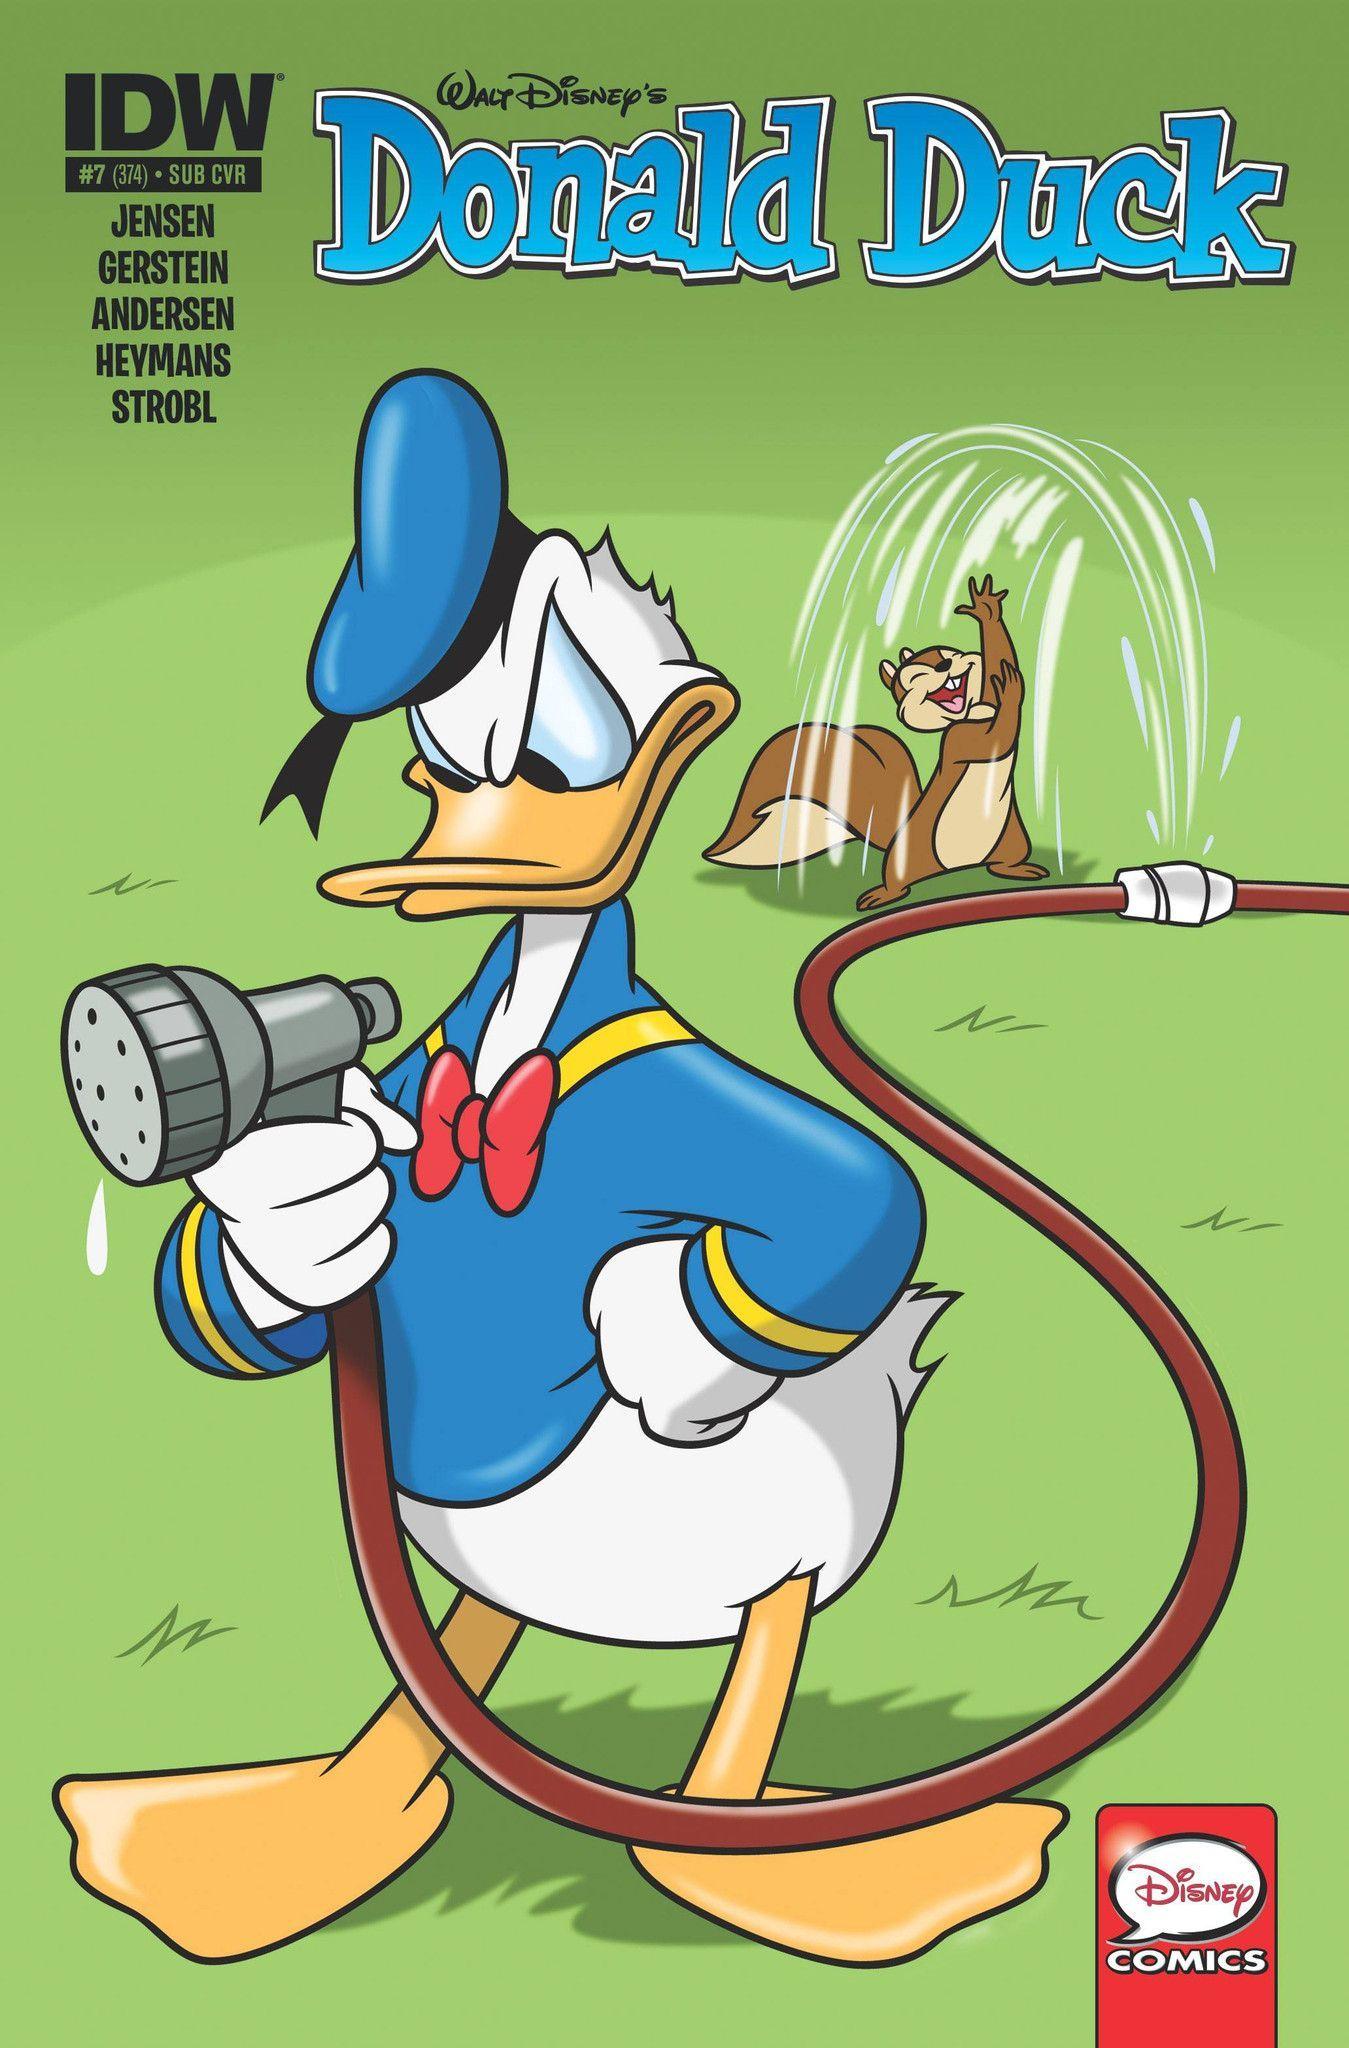 Donald Duck (2015) Issue 7 Donald duck, Donald duck